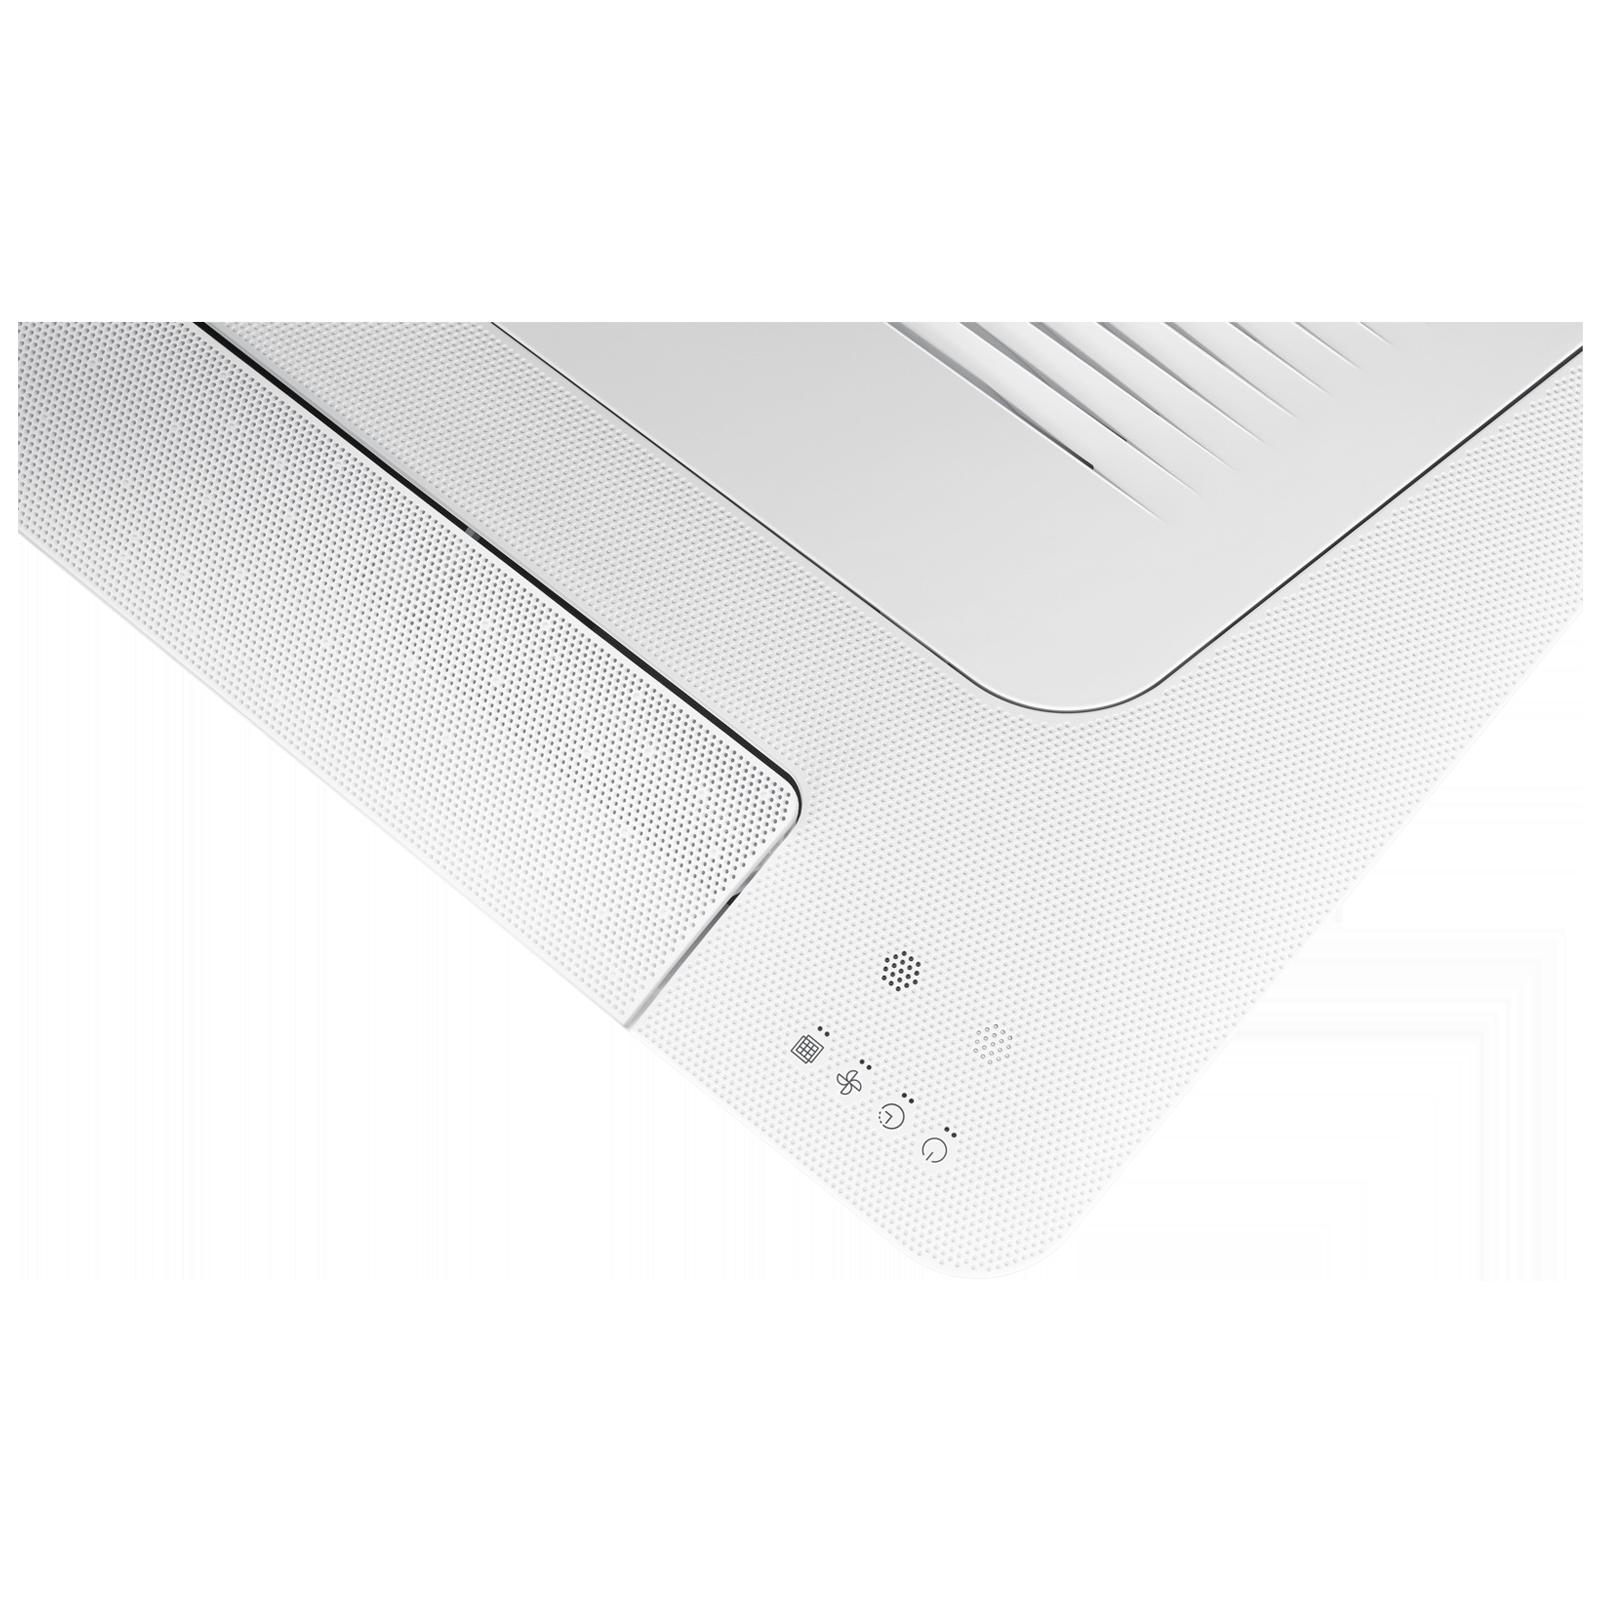 Samsung 1 Way Cassette 1 Ton 3 Star Inverter Cassette AC (Wi-Fi AC, Copper Condenser, AC036NN1PKC/TL, White)_3